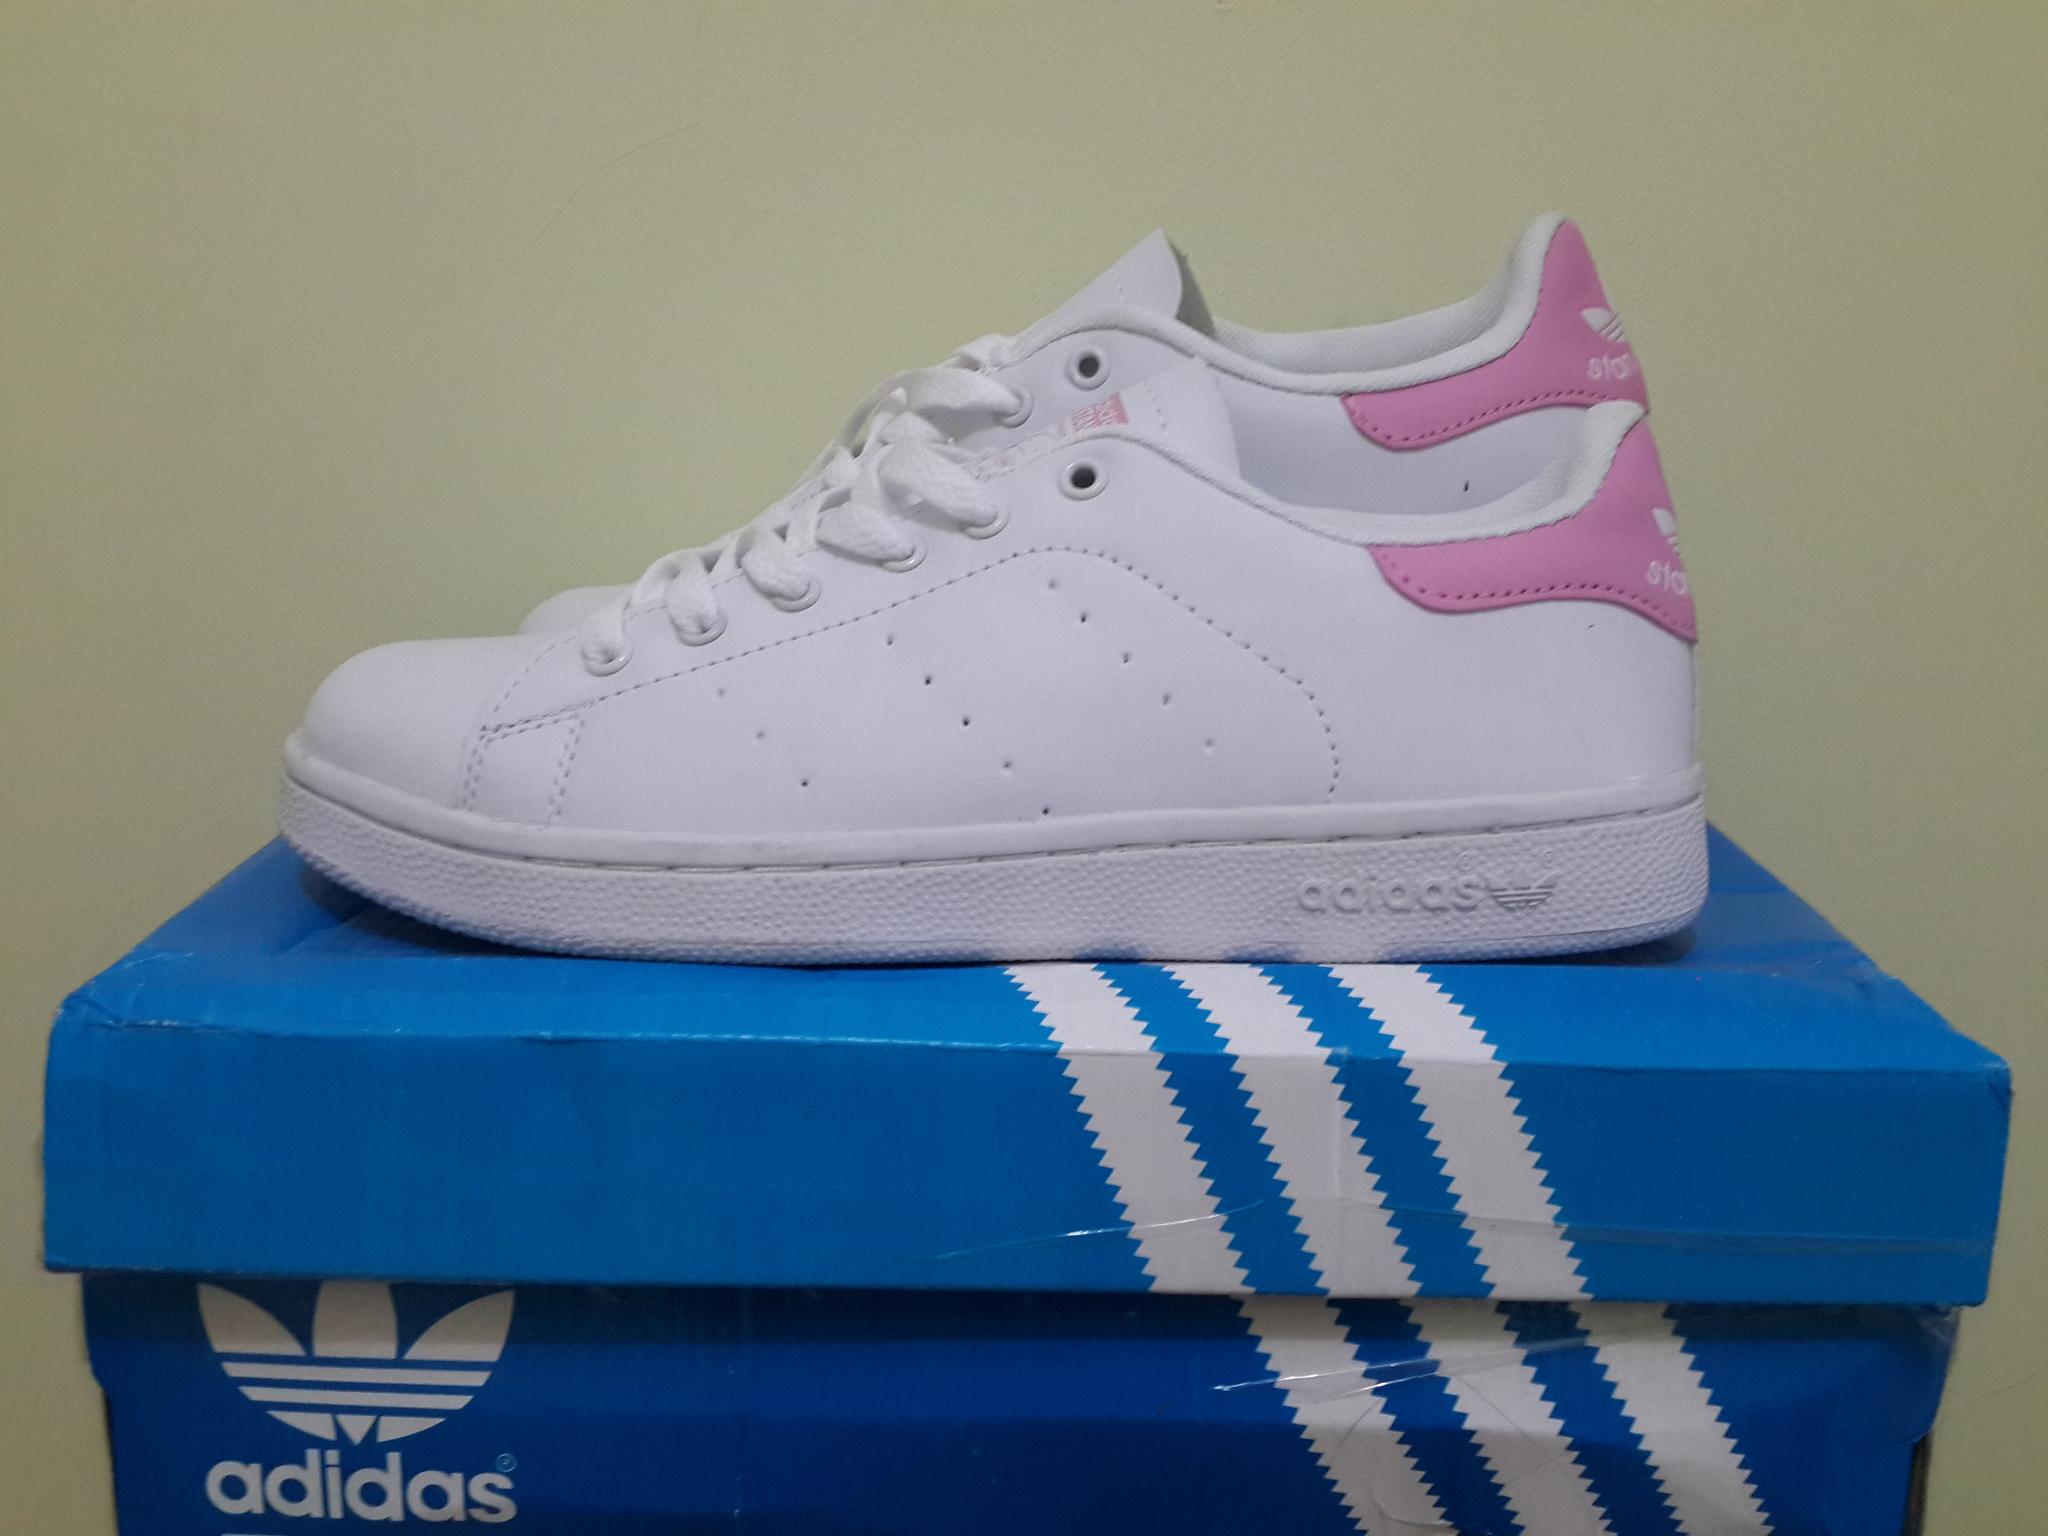 Jual Smith Sepatu Adidas Stan Smith Jual Putih Rosa Adidasshoes Tokopedia 845873